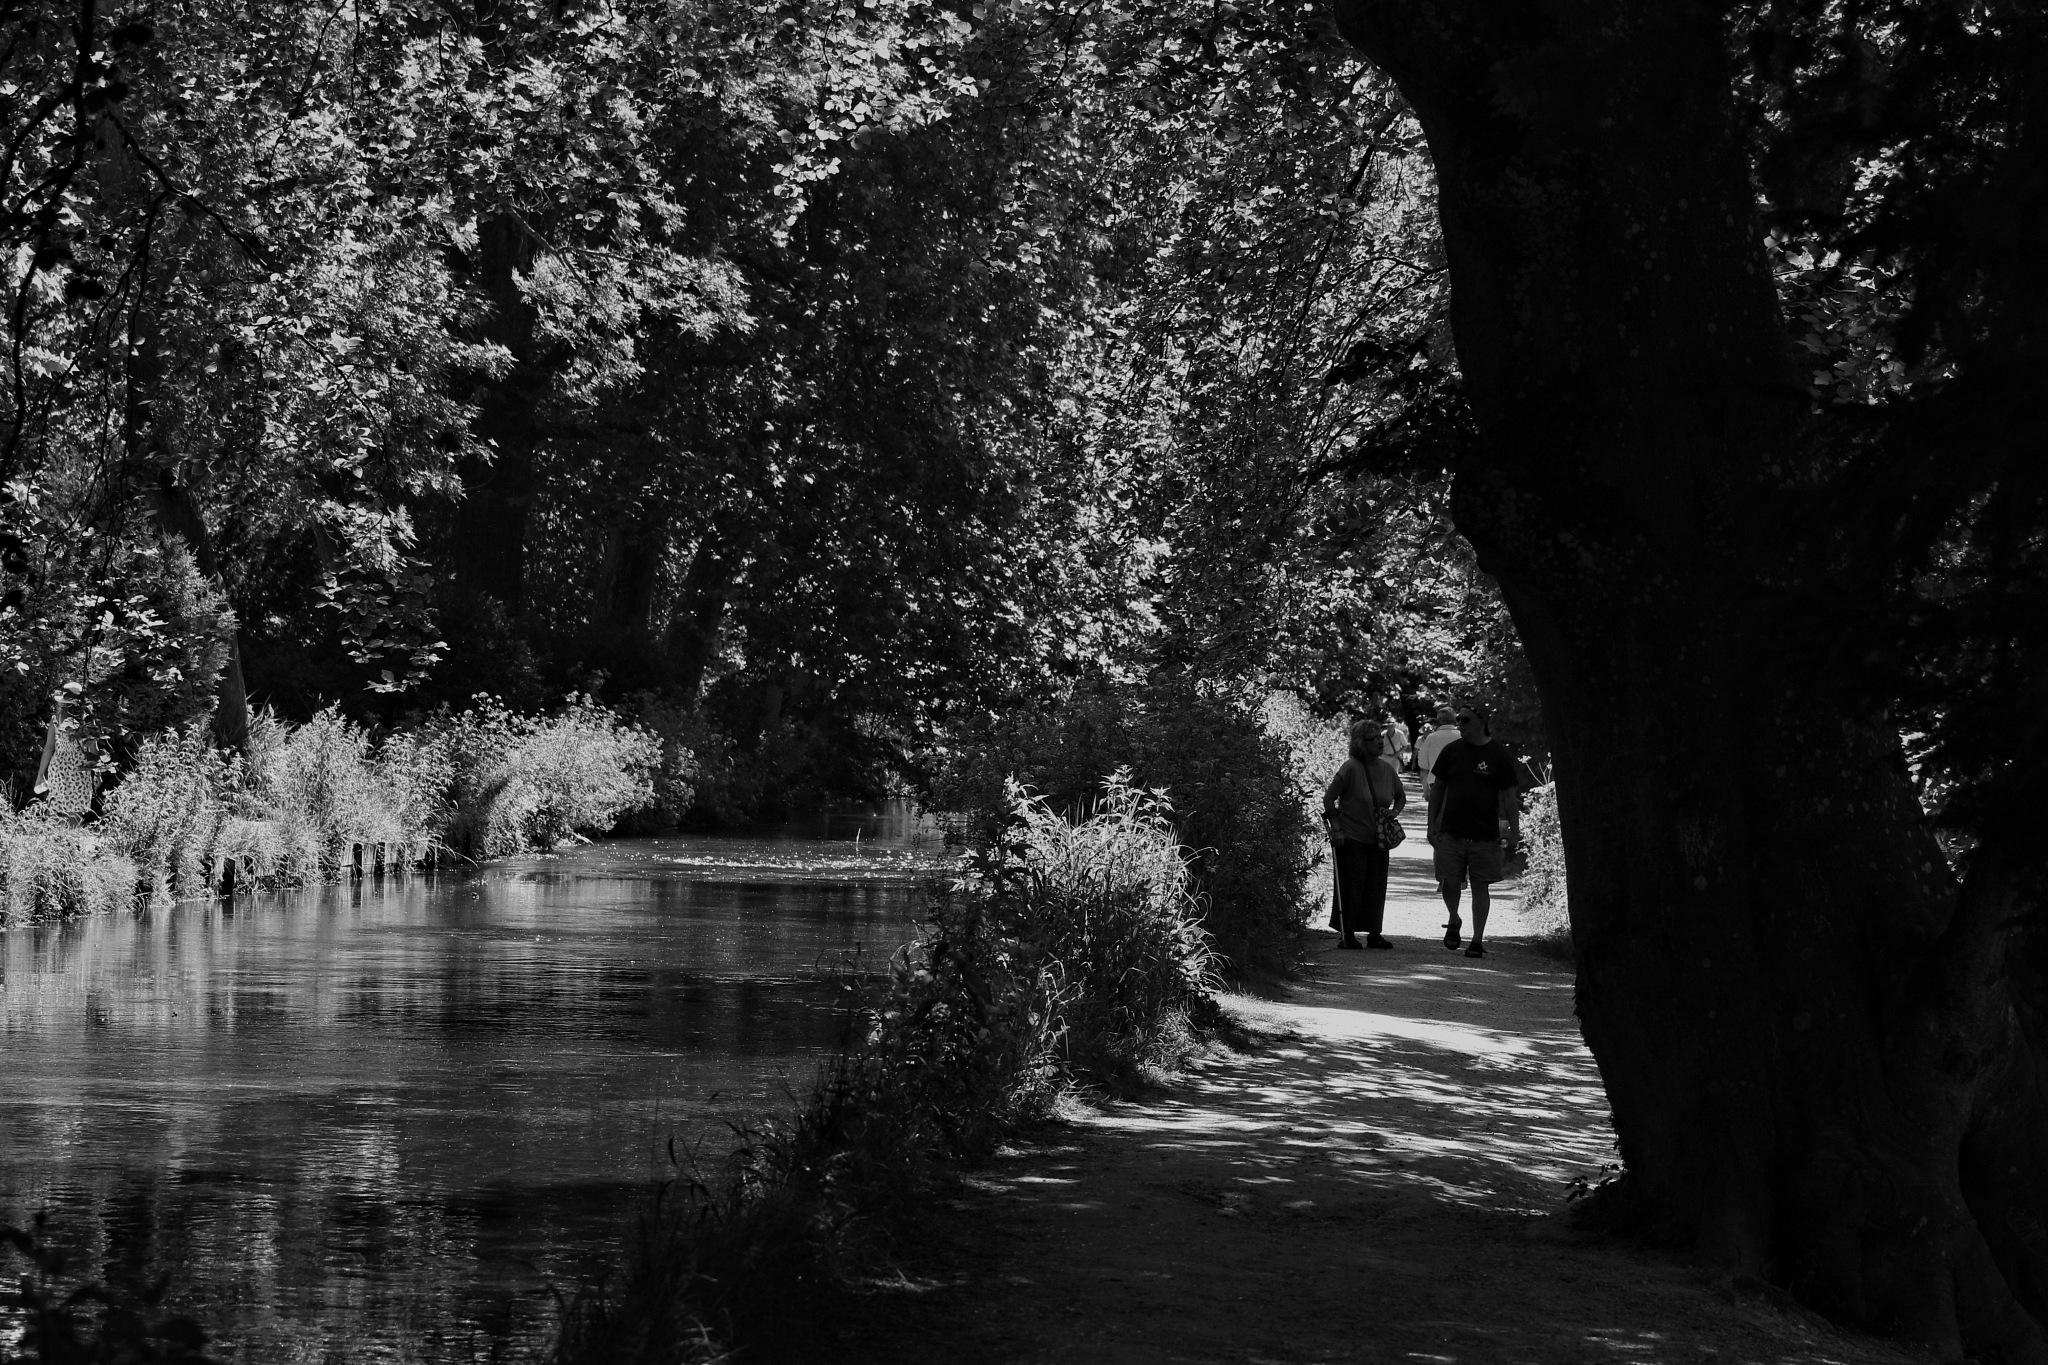 Riverbank by Rich66